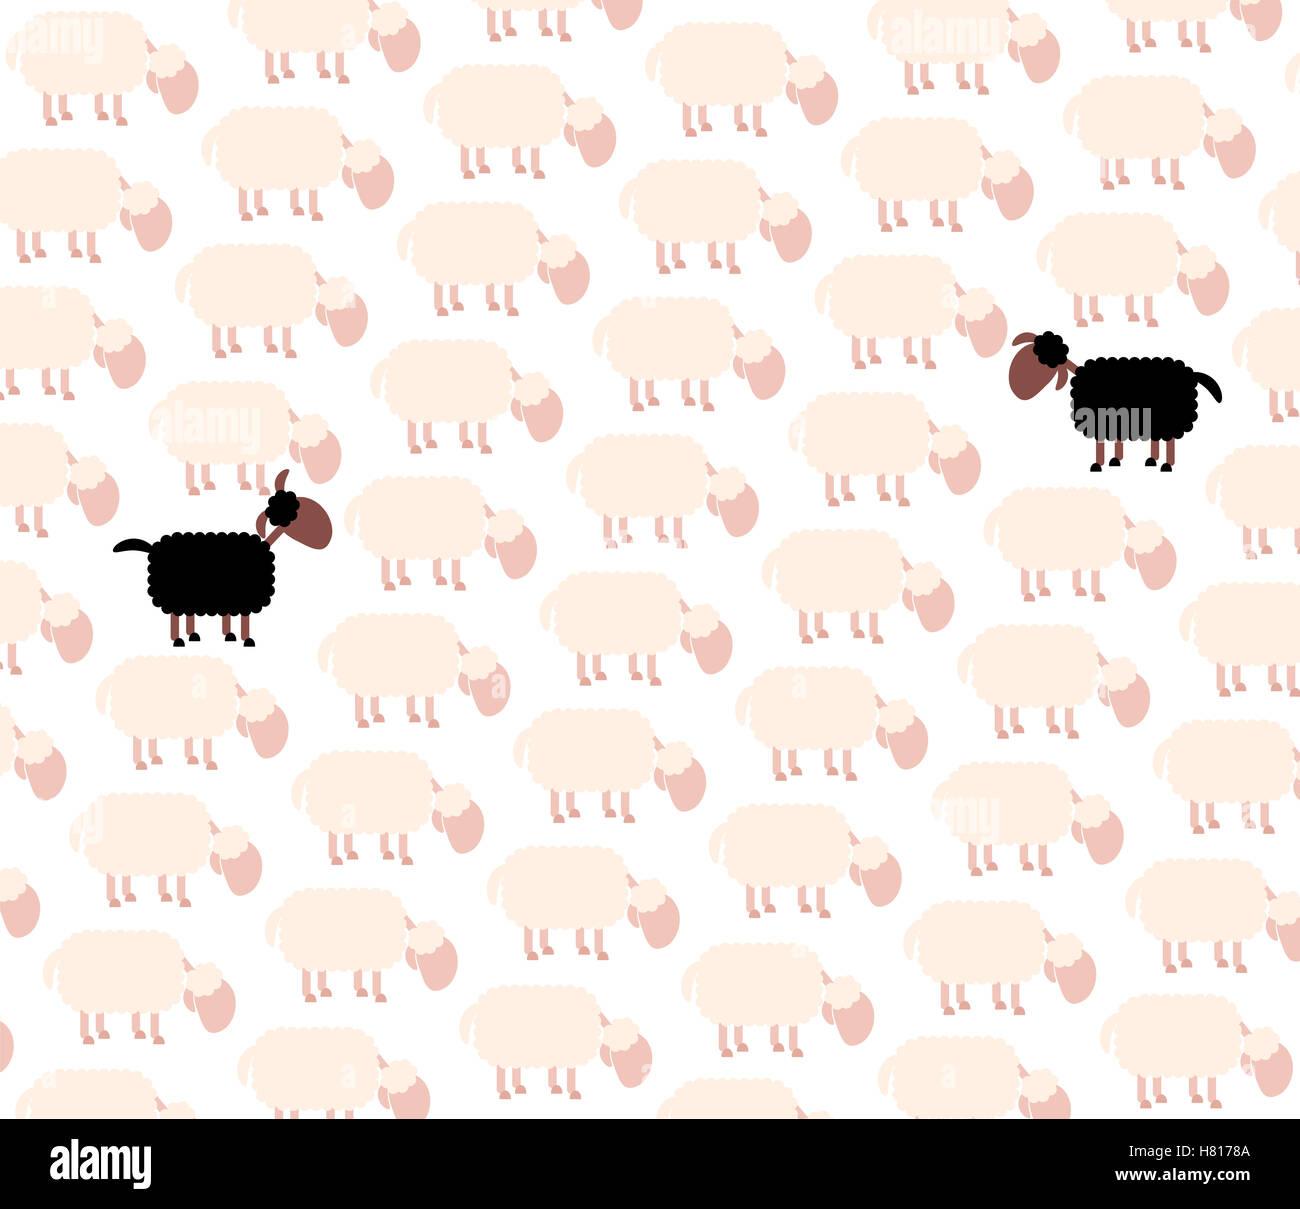 Black sheep - fellow sufferer - among white sheep flock. - Stock Image